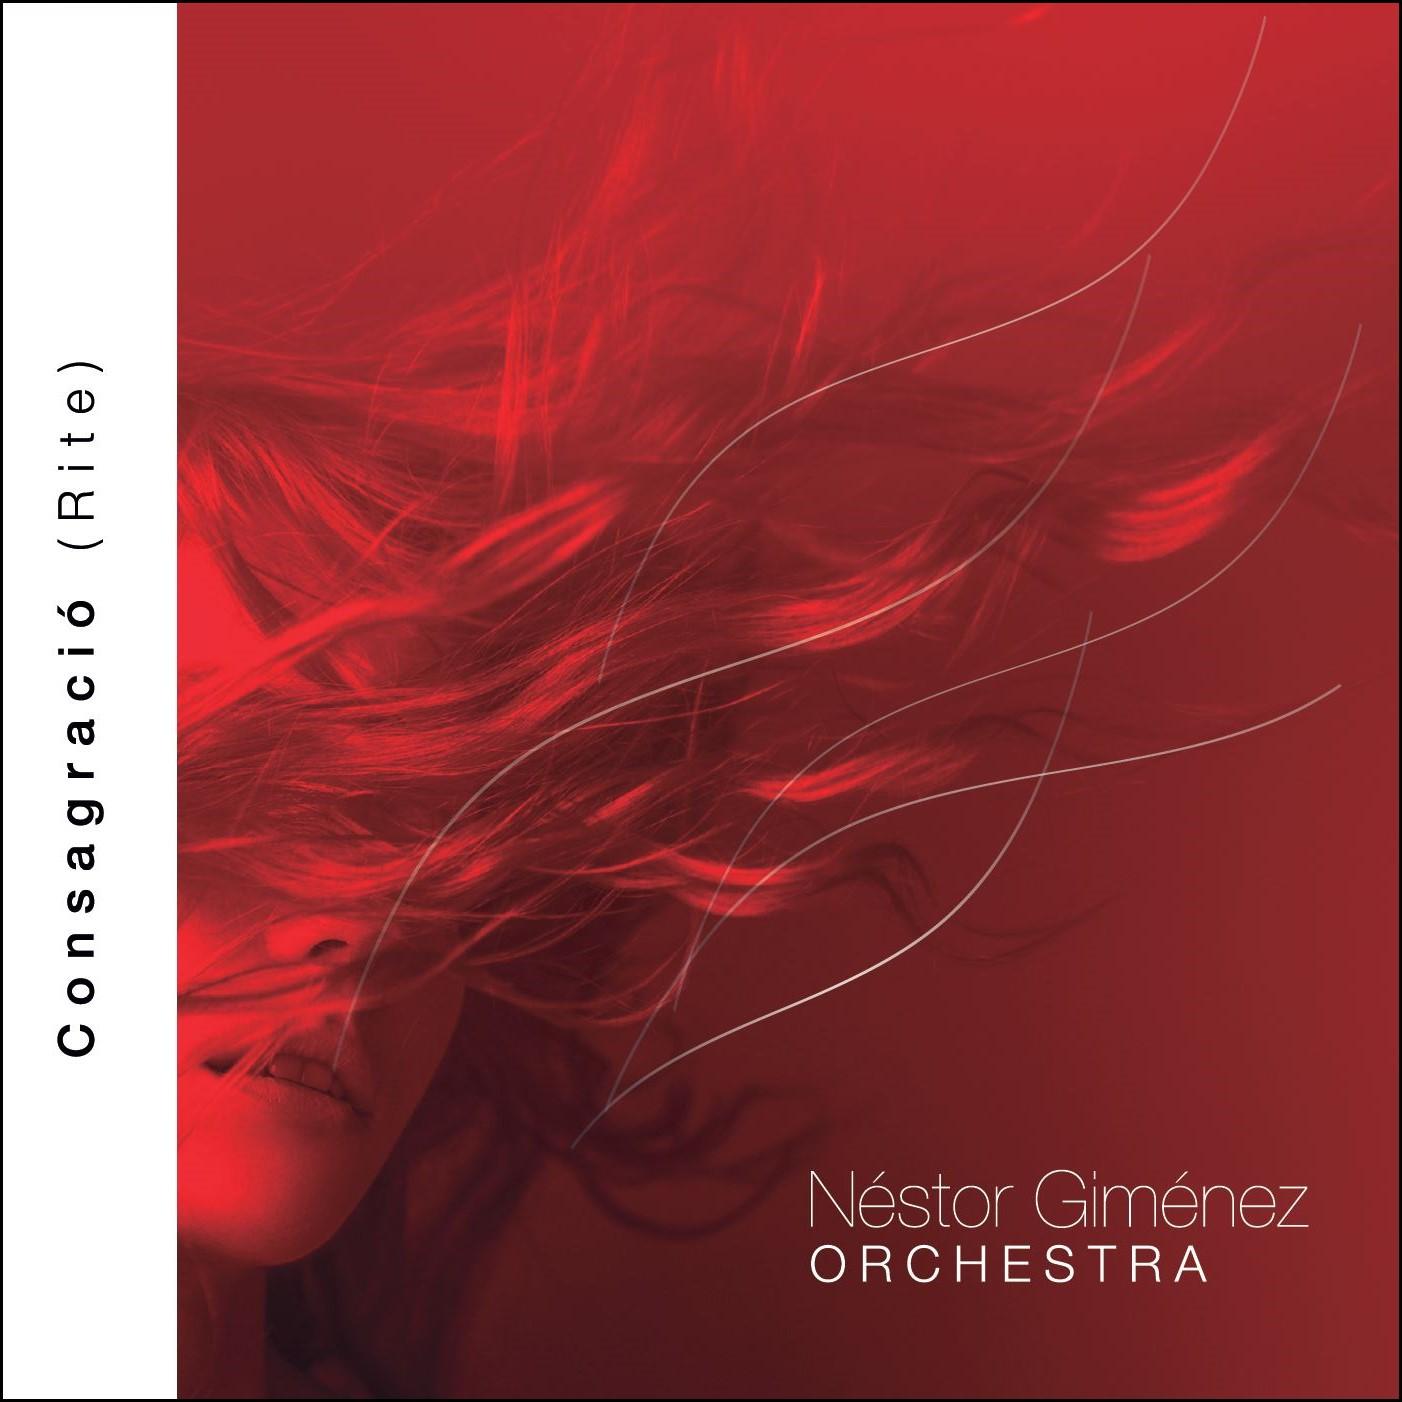 Néstor Giménez Orchestra: RiteJazz Granollers 2018